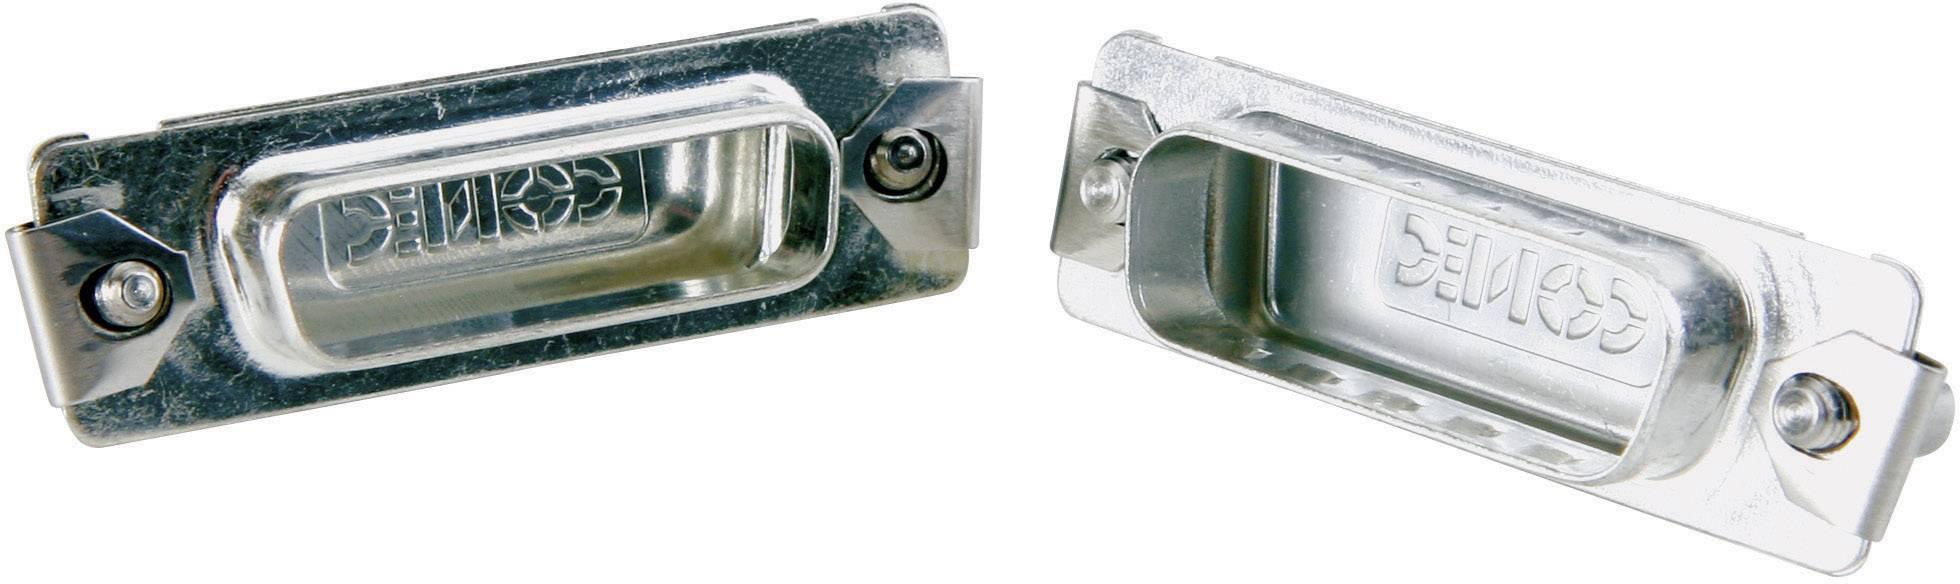 Záslepka D-SUB konektoru Conec 165X16779X, strieborná, 1 ks